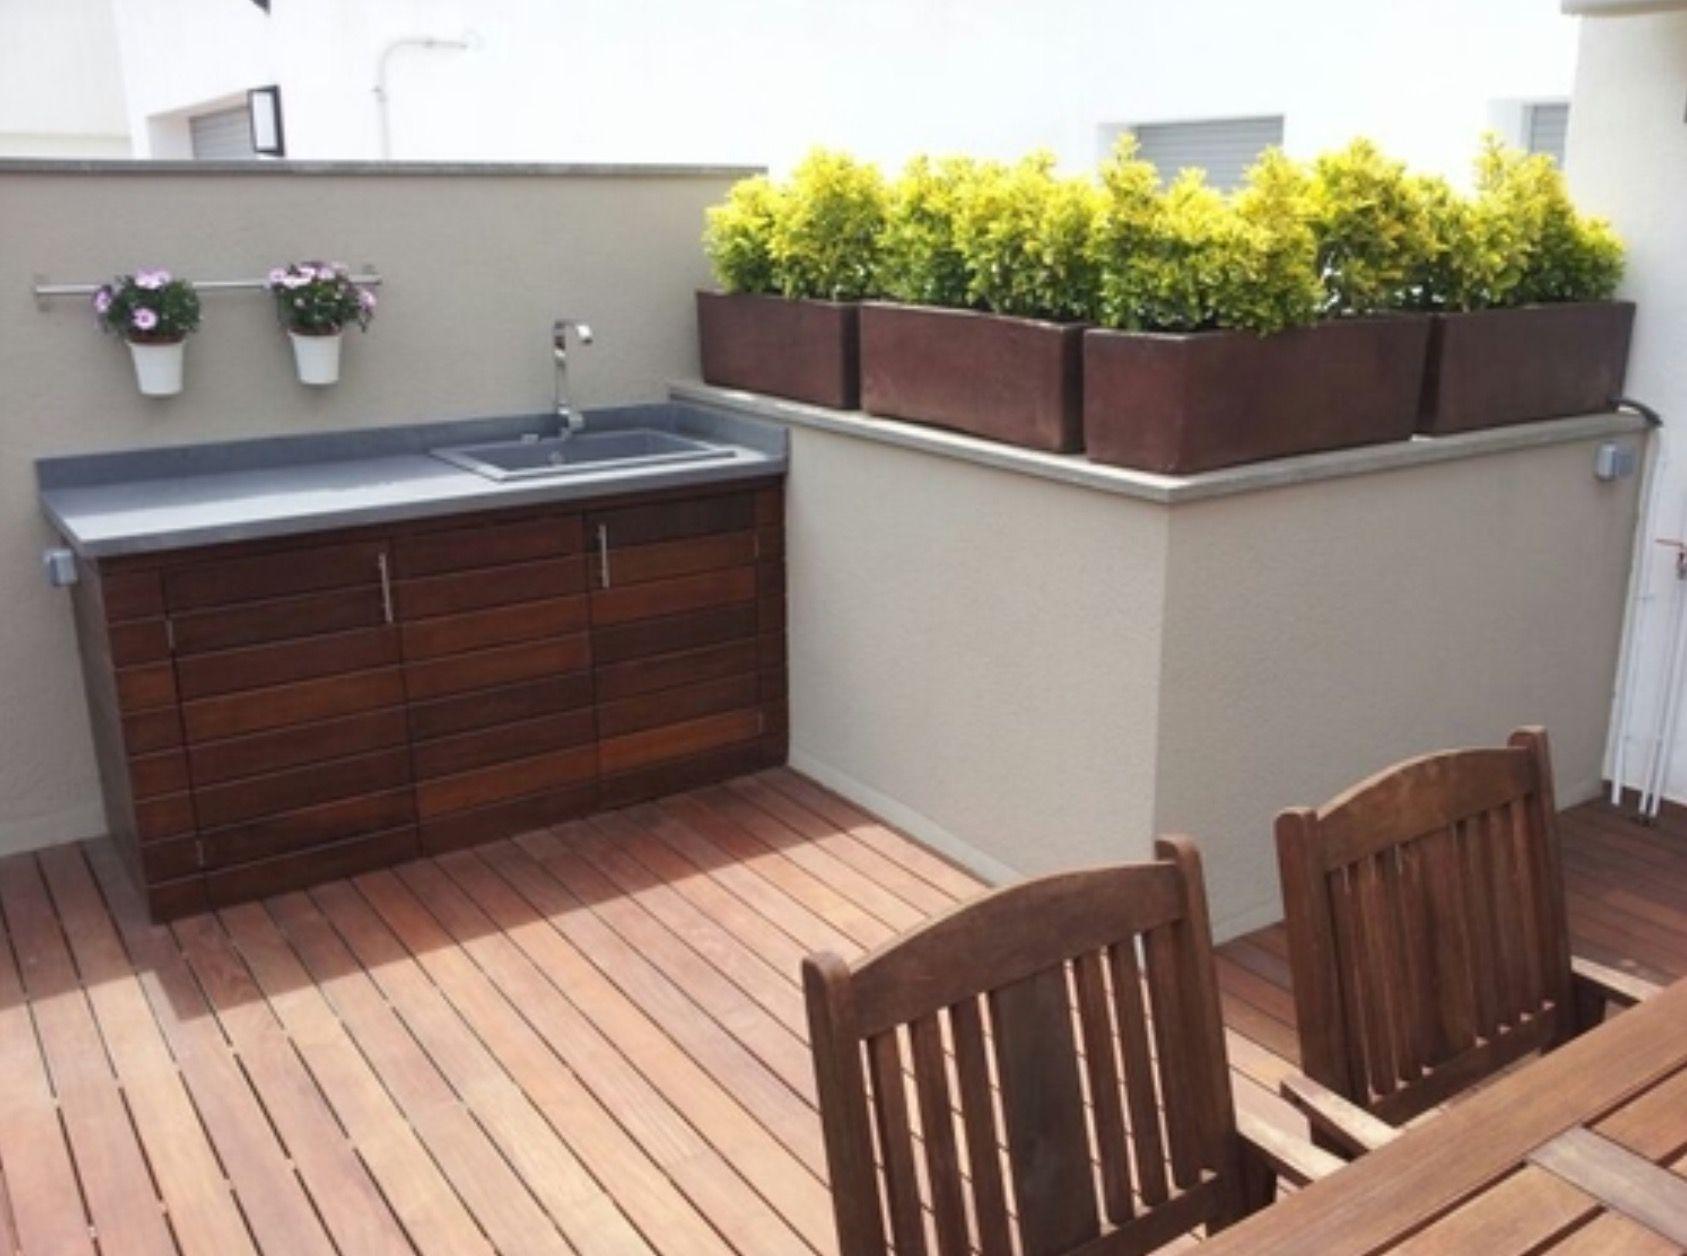 Fregadero en la terraza  Terraza en 2019  Fregaderos